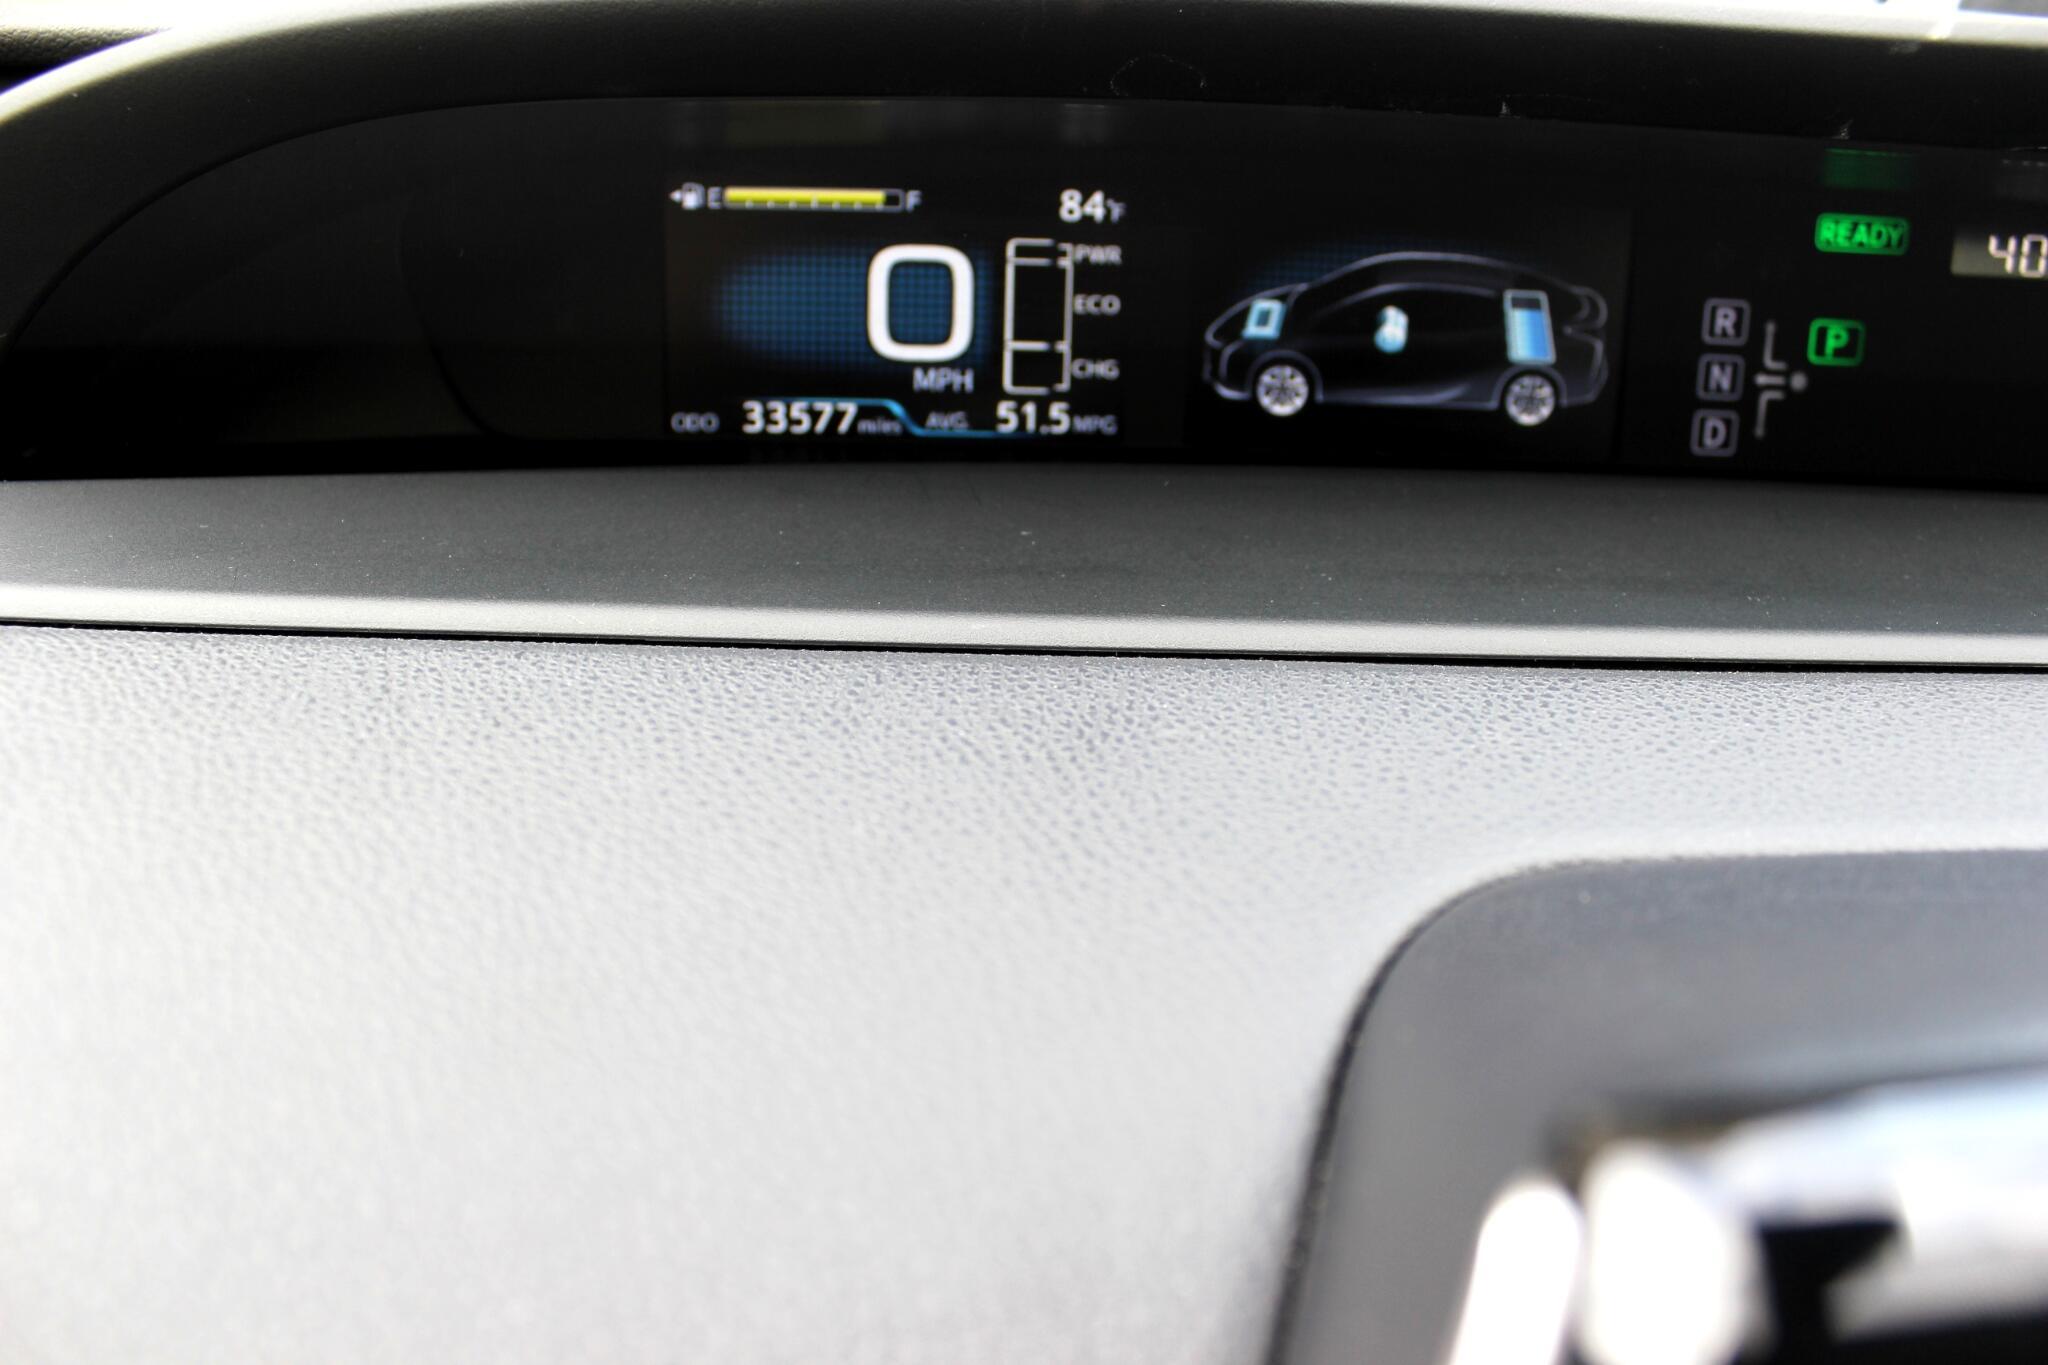 Used 2018 Toyota Prius in Twinsburg, OH   Auto com   JTDKBRFU7J3588805